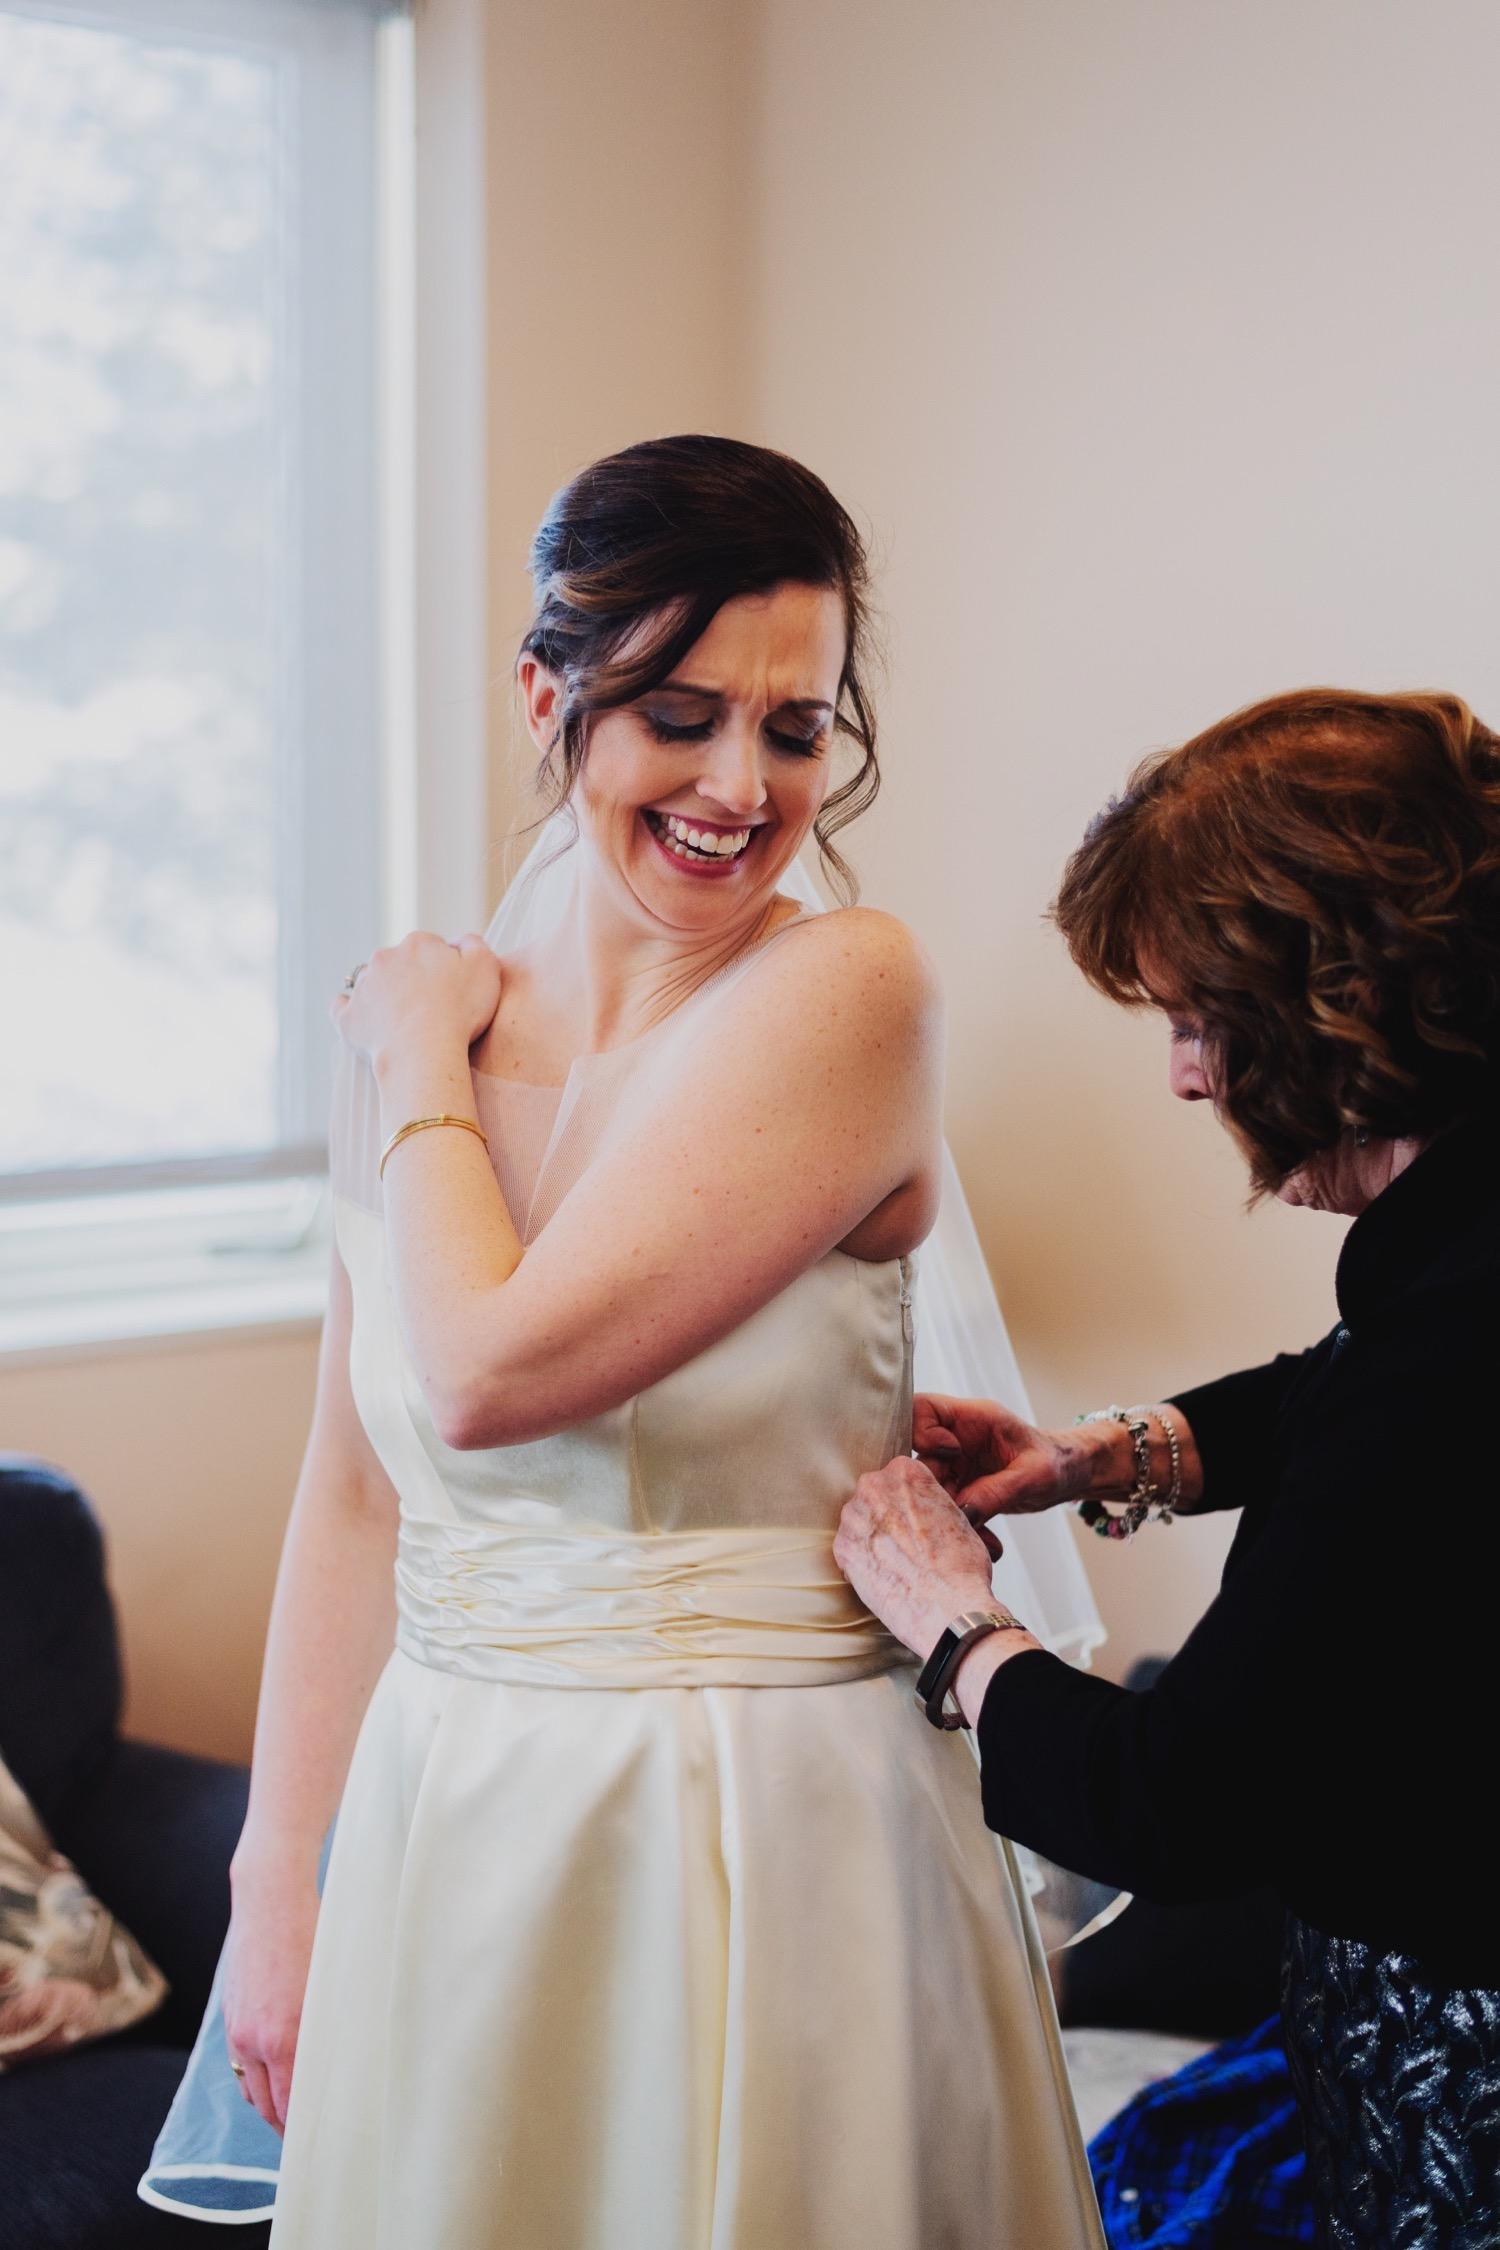 007_McGrath-Libertyville-IndependenceGrove-Winter-Wedding_0009_Independencegrovewedding.jpg